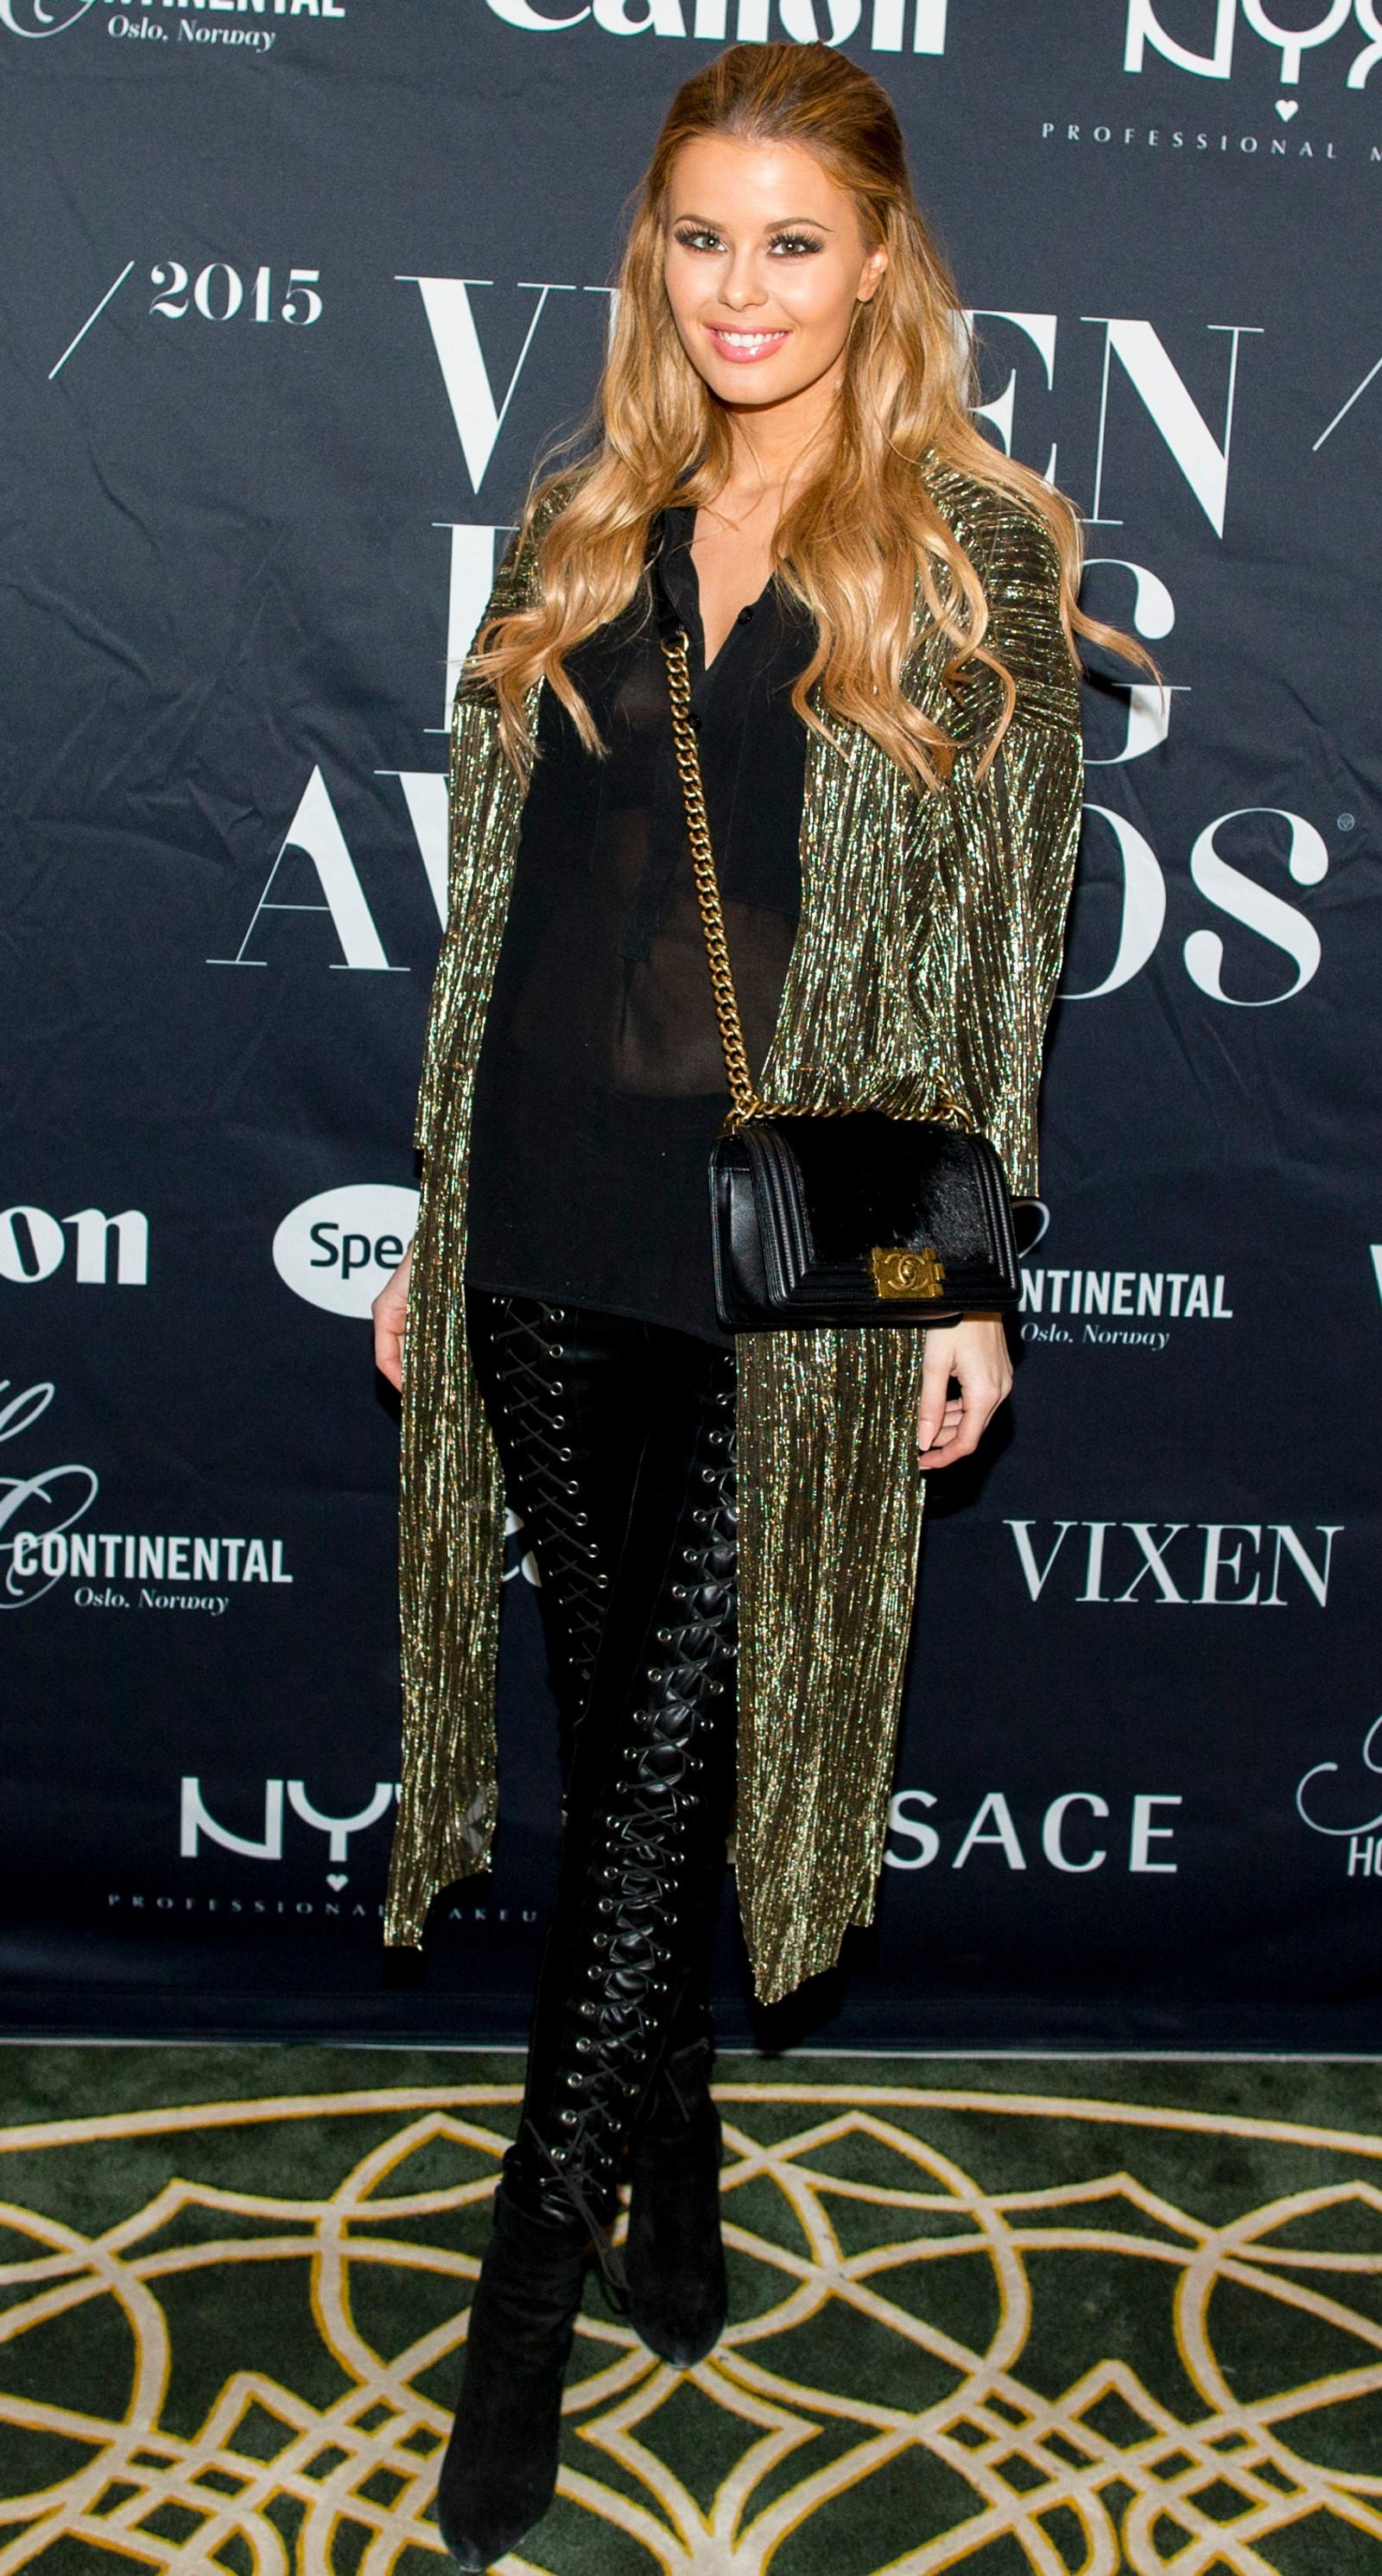 Annette Haga ankommer Vixen Blog Awards 2015 på Hotel Continental i Oslo fredag kveld.